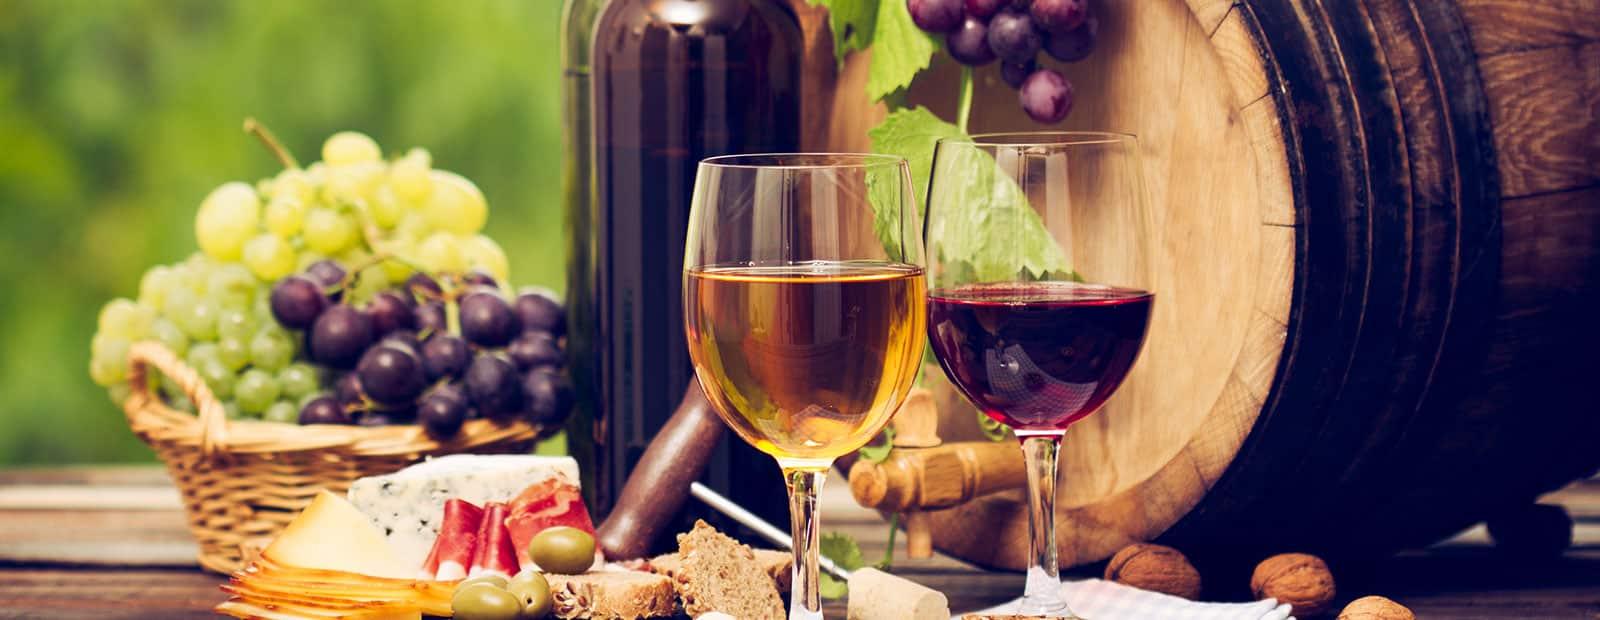 Niagara fall wine tour